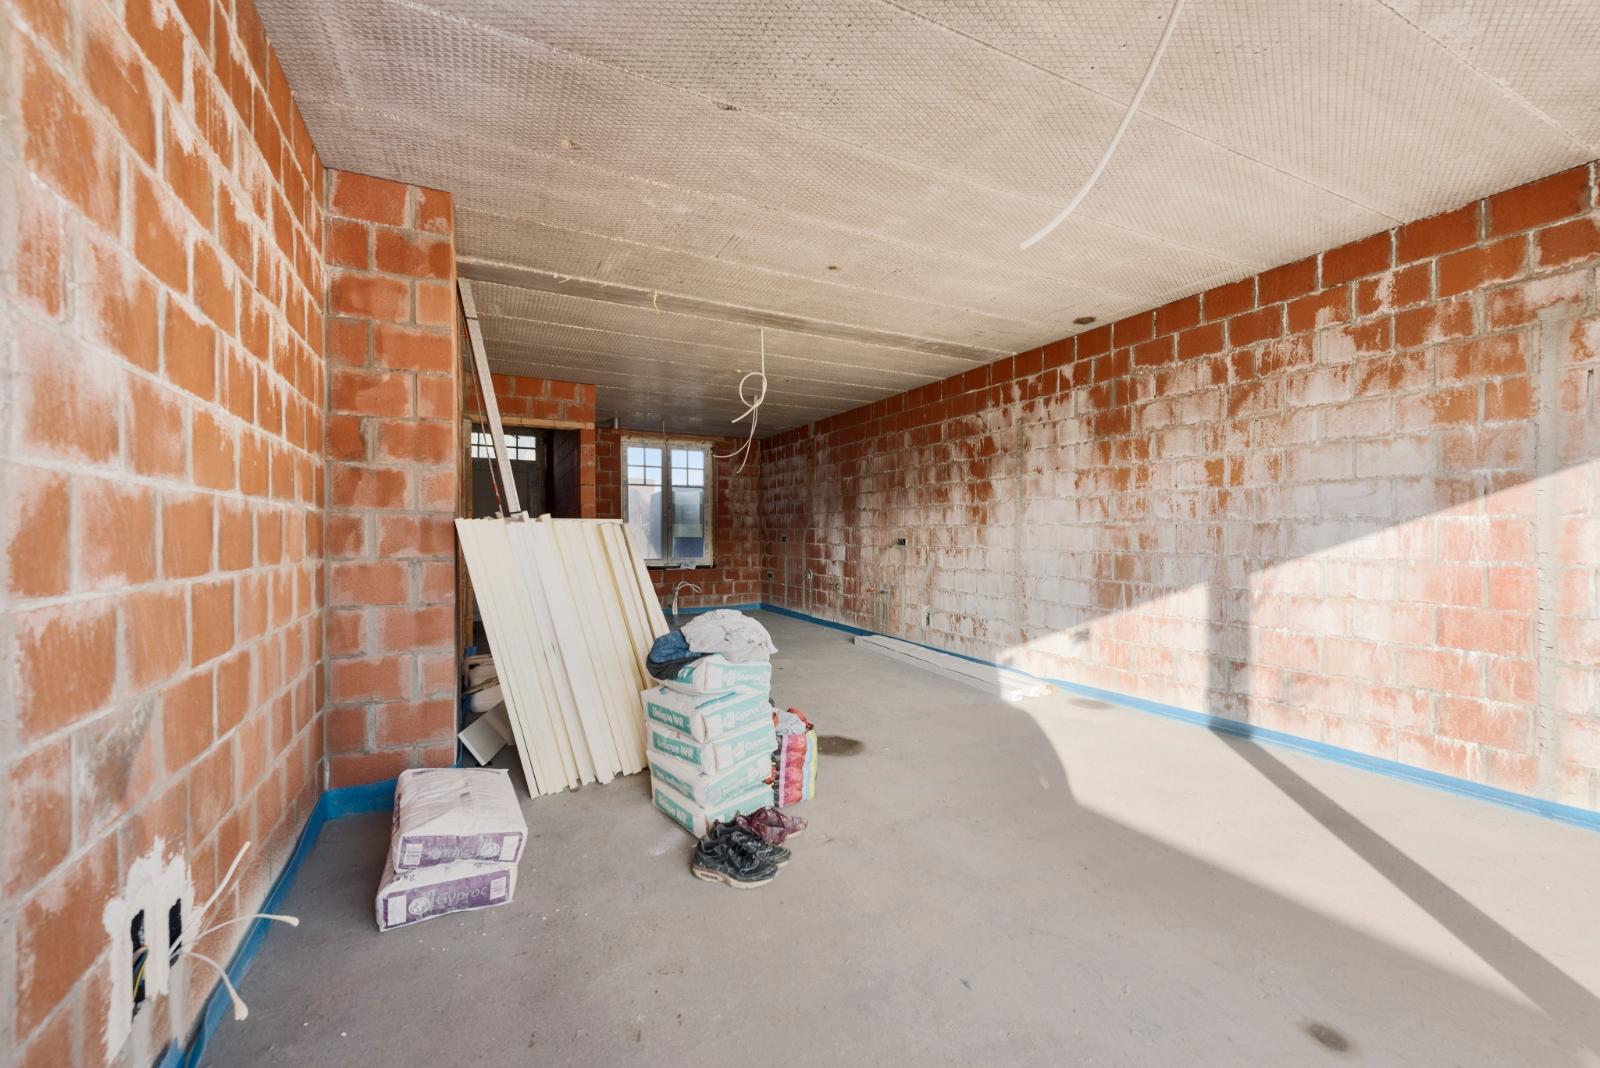 Kwaliteitsvolle nieuwbouwwoning in centrum Leke - 5